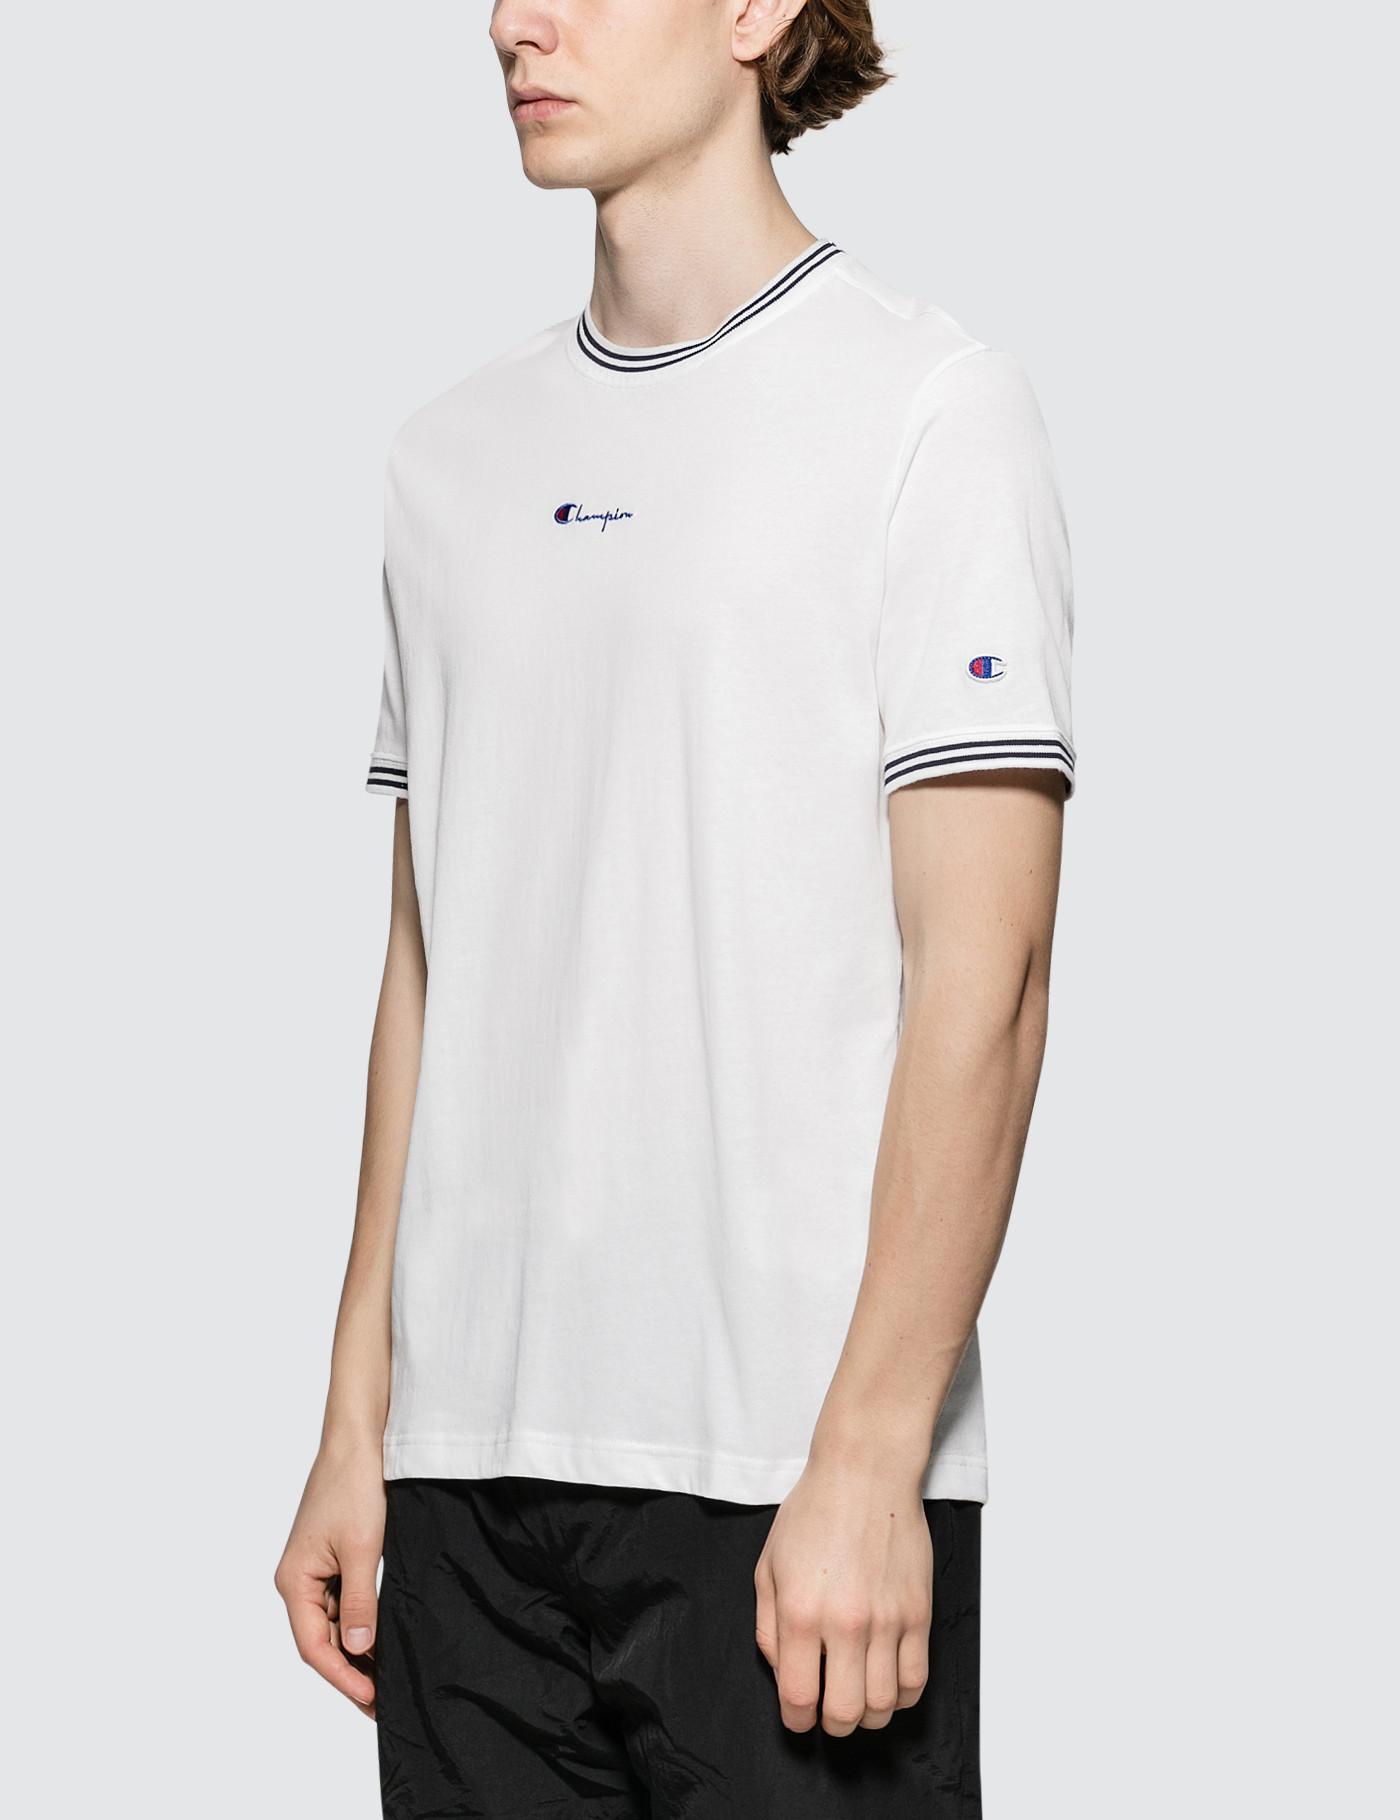 7c24ec76331a7a Lyst - Champion Rib Neckline S s T-shirt in Black for Men